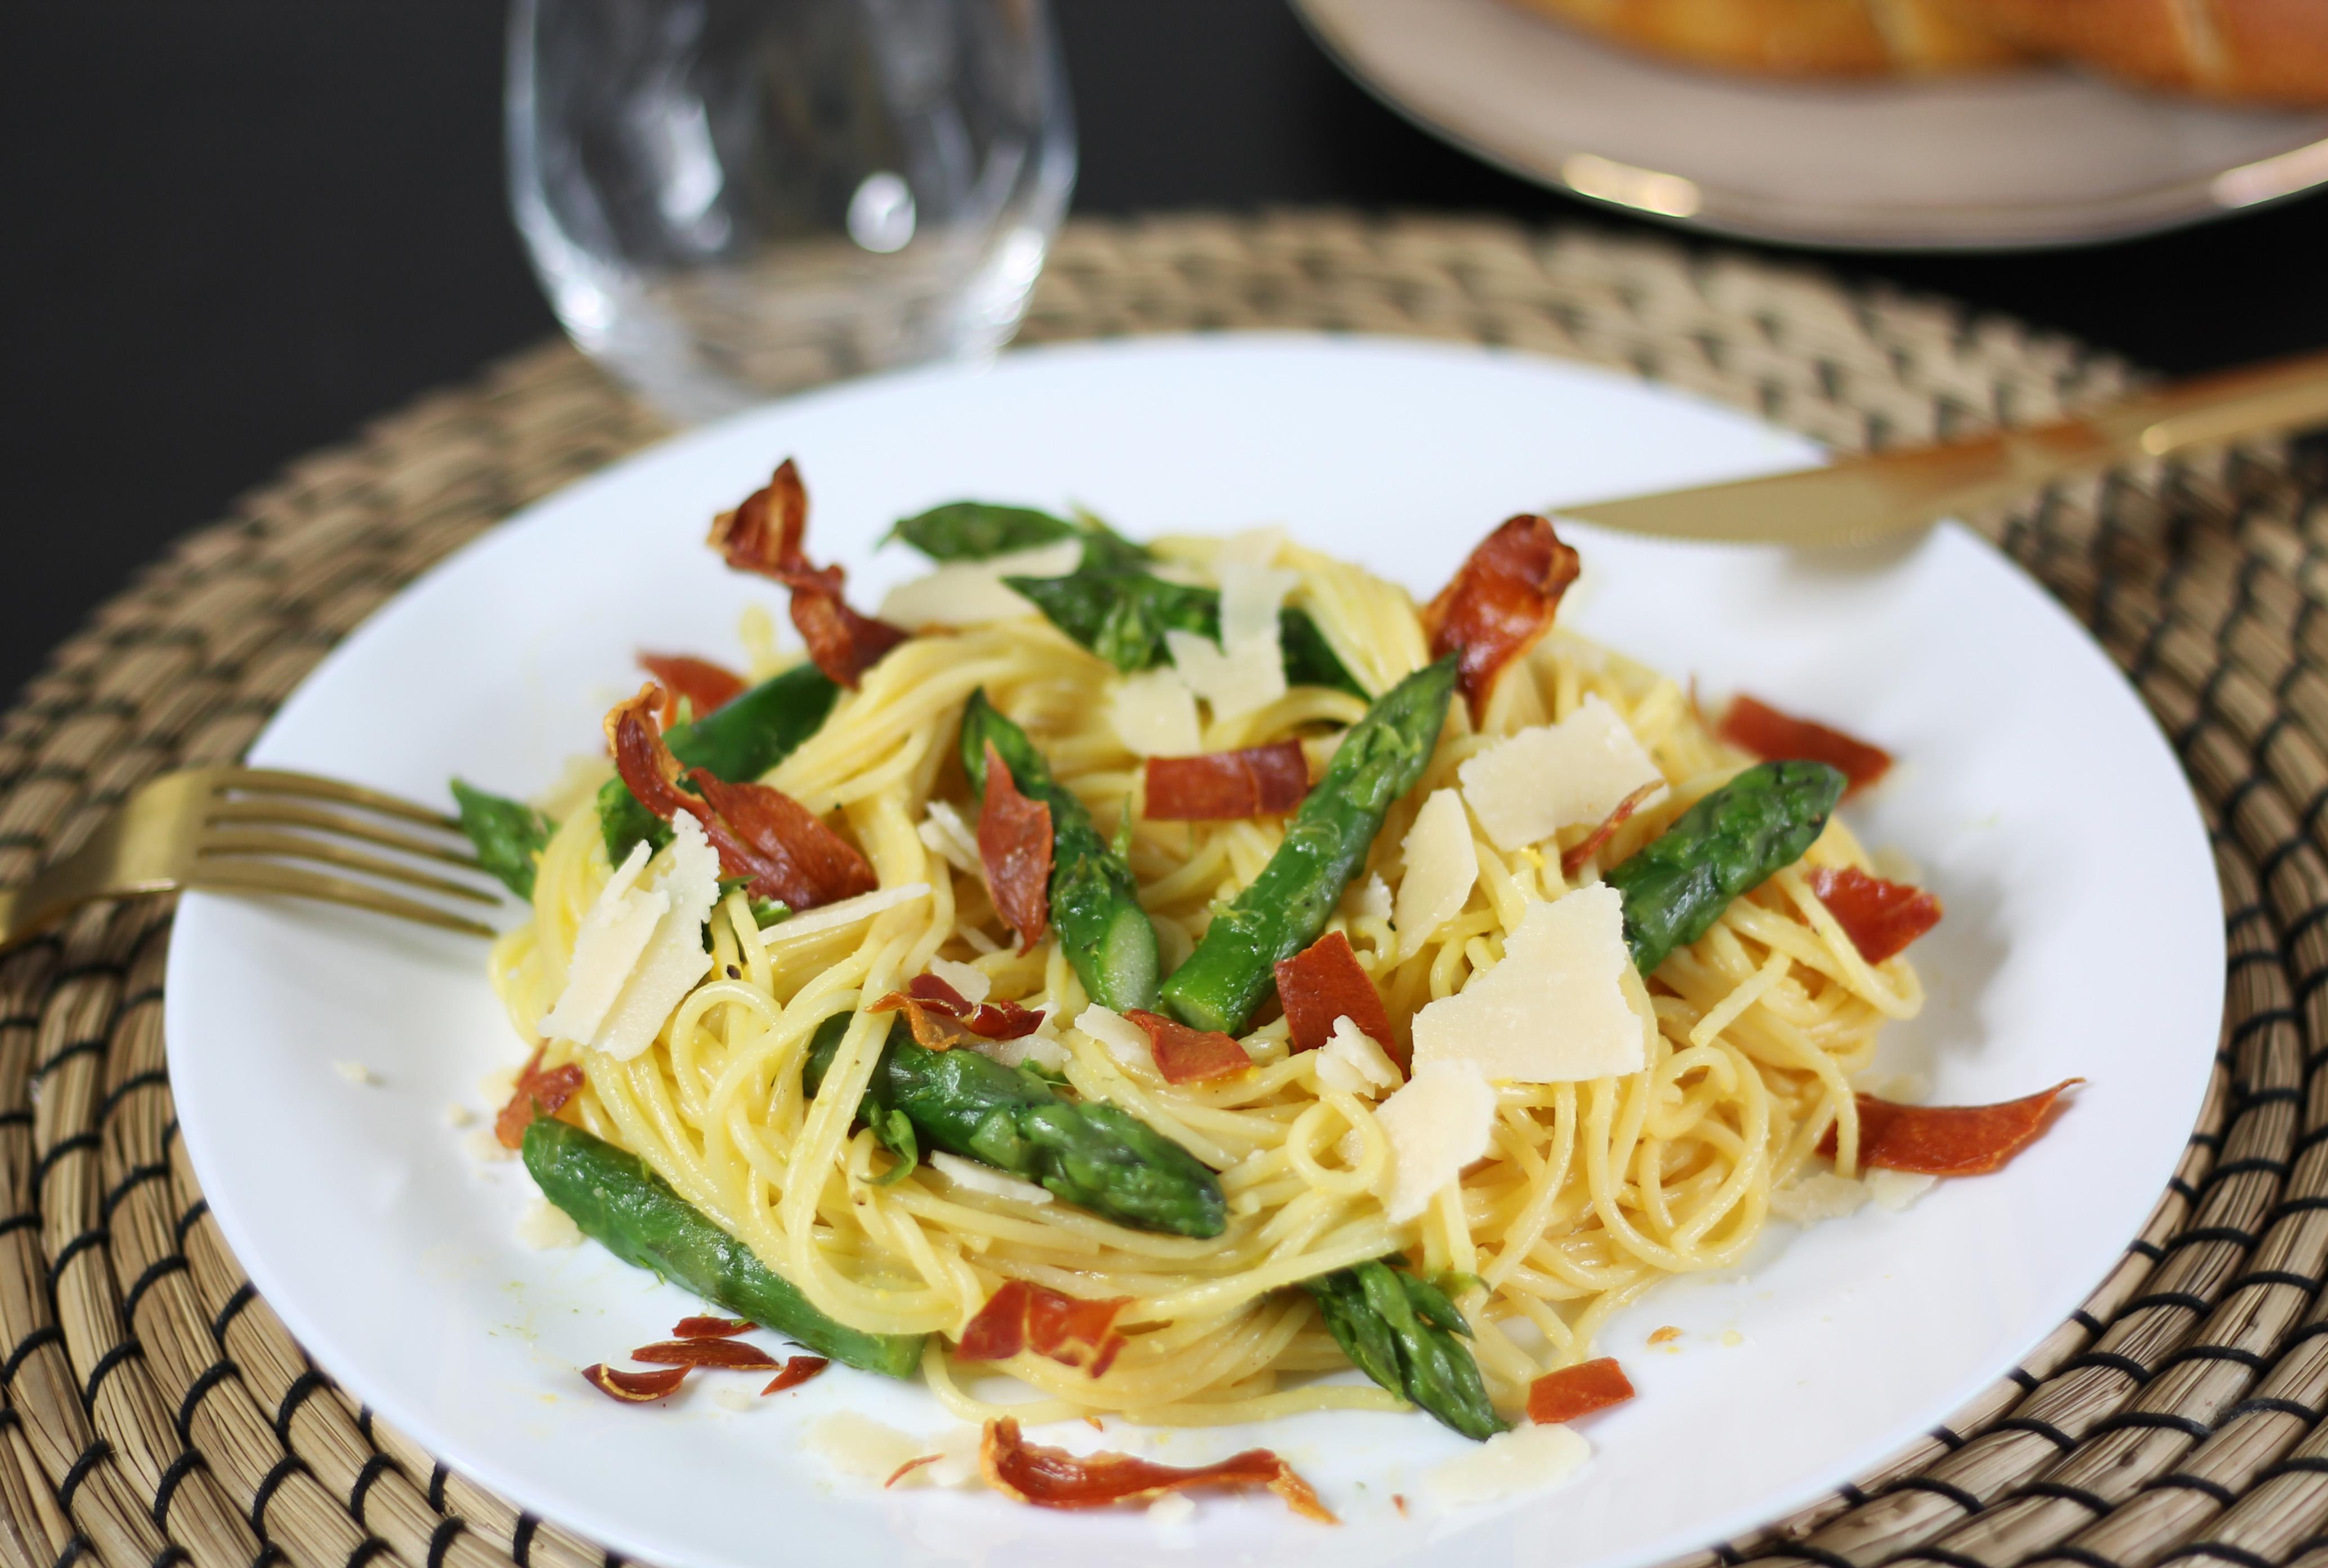 Spaghetti asperges vertes, parmesan et jambon cru by Fanny Albx